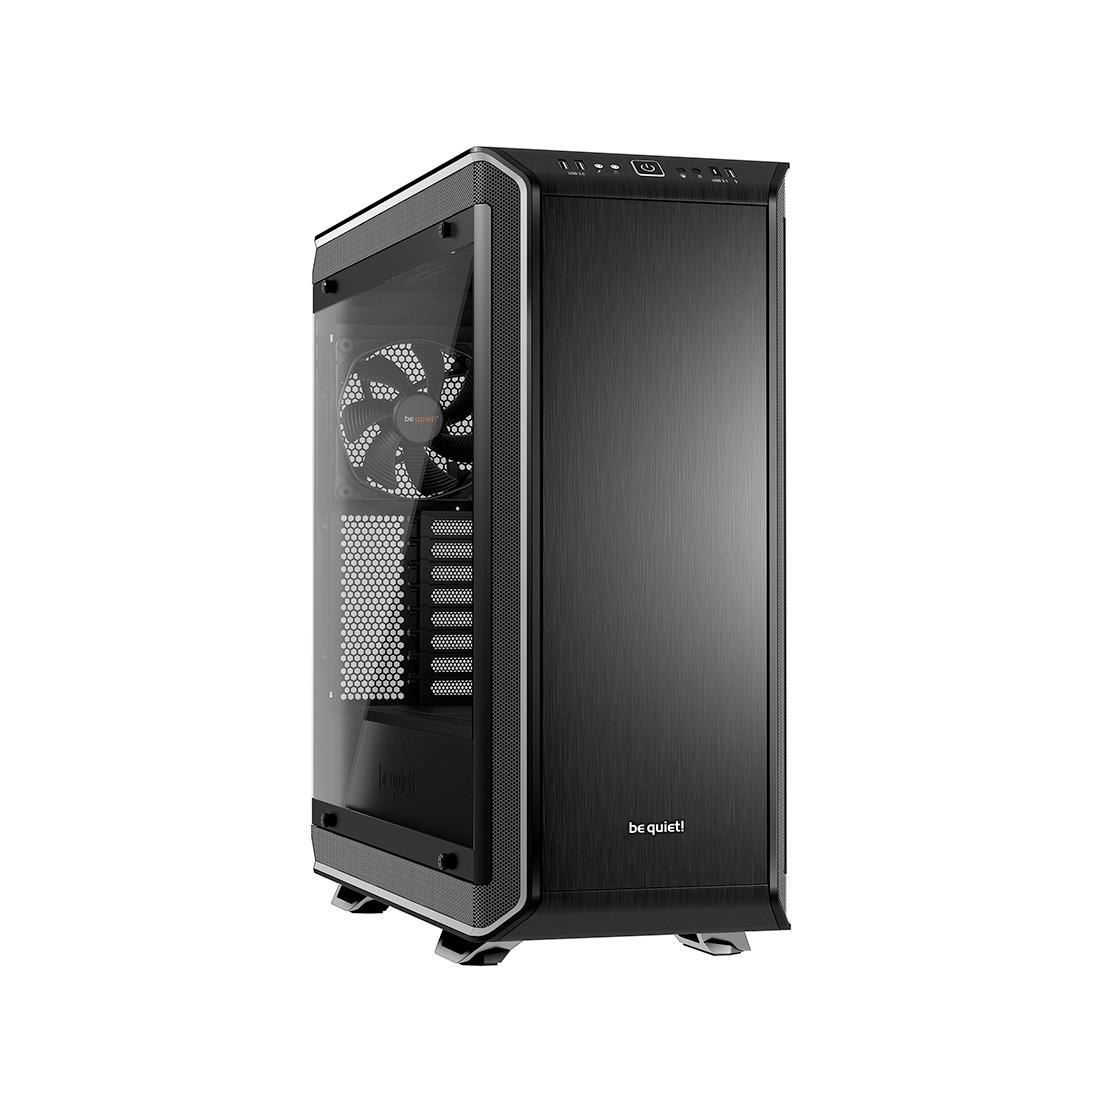 Компьютерный корпус, Bequiet!, Dark Base Pro 900, BGW16, E-ATX / XL-ATX / ATX / Micro ATX / Mini-ITX, USB